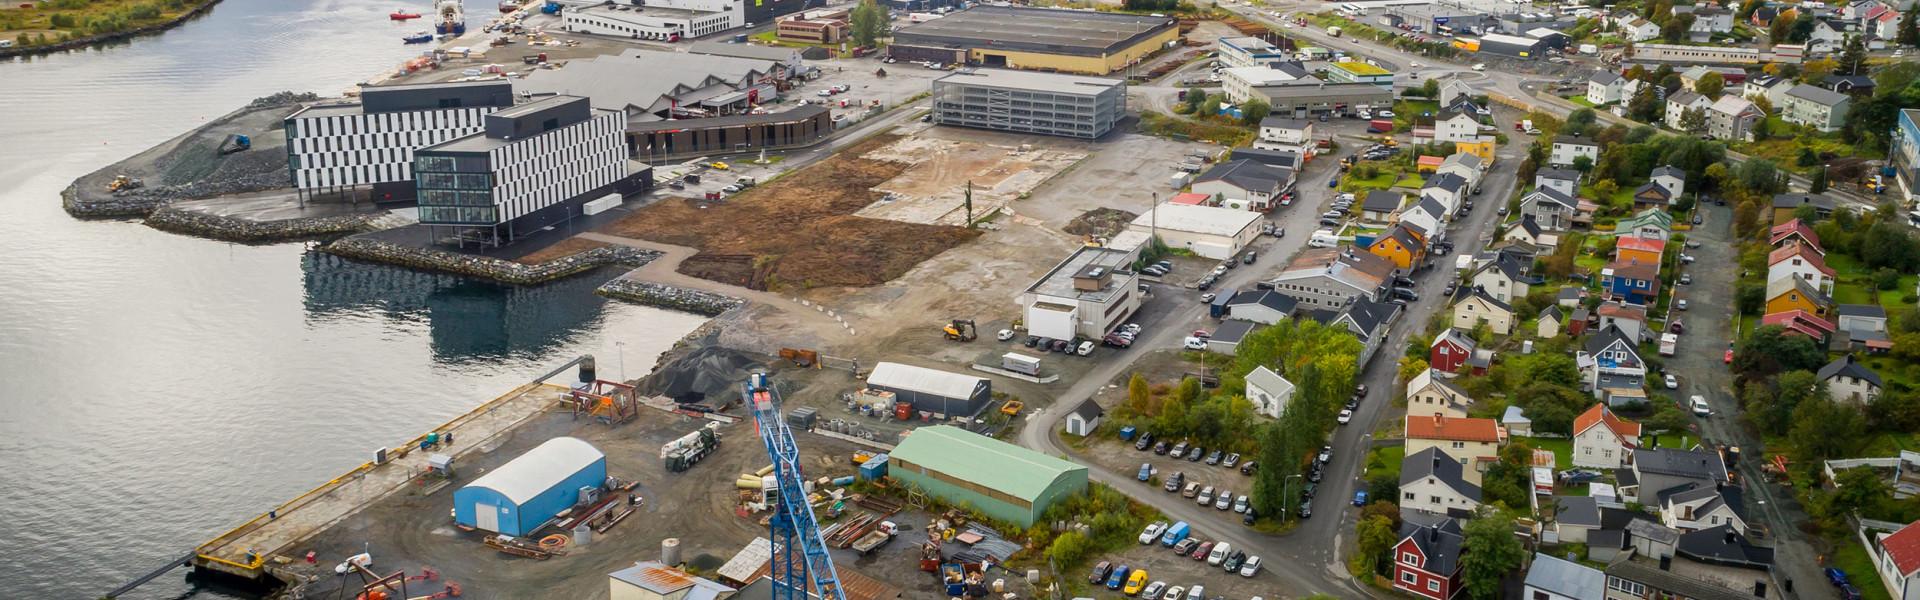 Utviklingsområde i Harstad sentrum